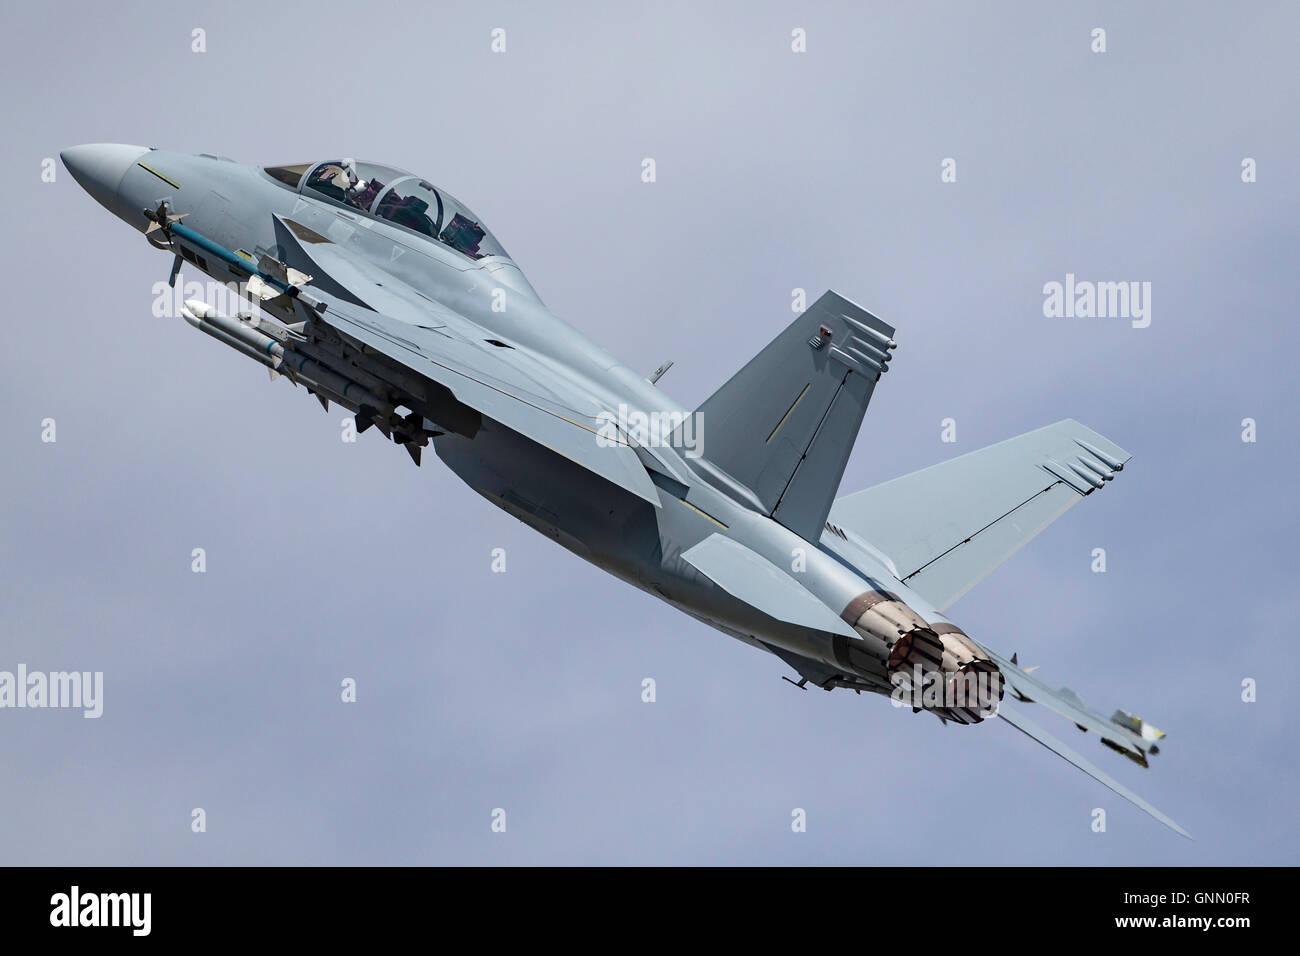 Marina degli Stati Uniti Boeing F/A-18F Super Hornet multirole Fighter Aircraft. Foto Stock